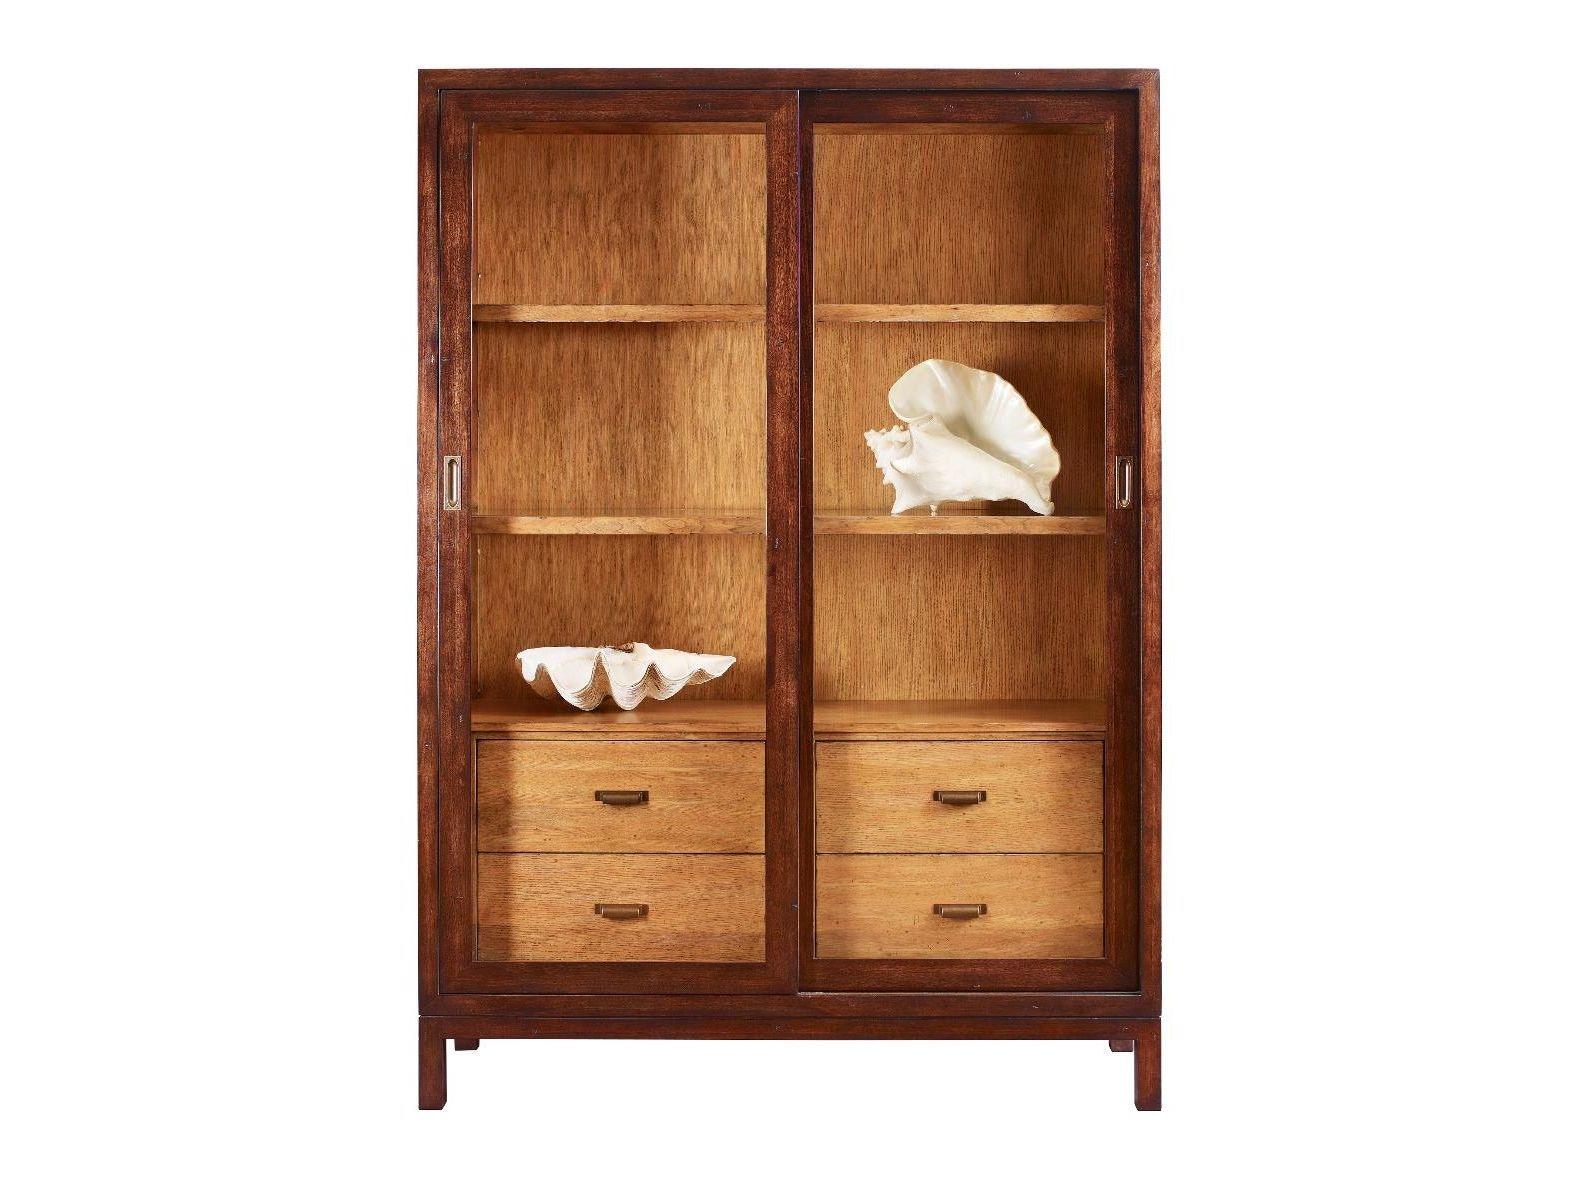 Incroyable Fine Furniture Design Living Room Display Cabinet 1160 995   McCreerys Home  Furnishings   Sacramento, Rancho Cordova And Roseville CA